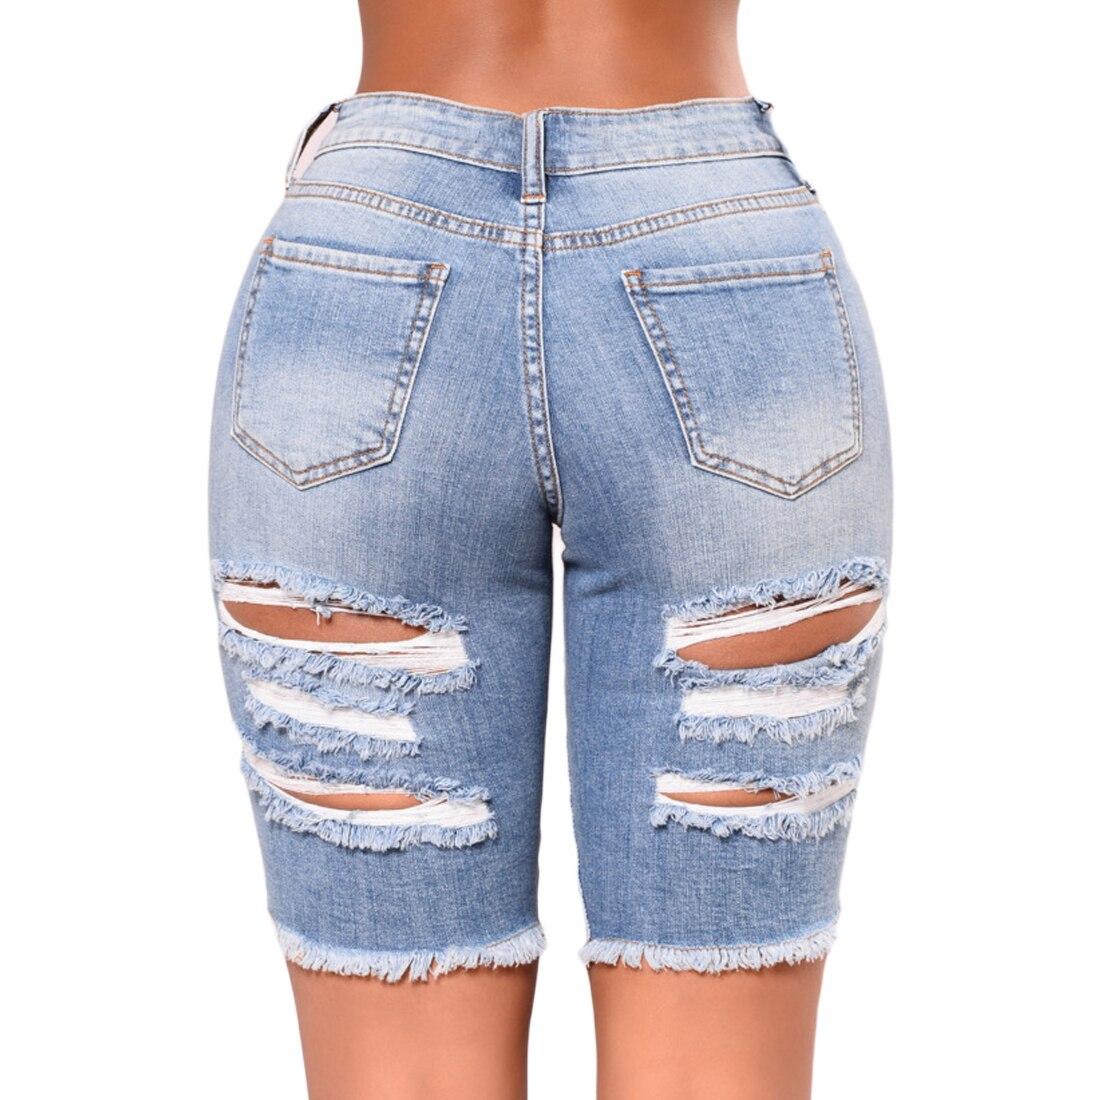 New   Women Fashion High Waist Half Ripped Jeans Street Hole Slim Torn Femme Denim Shorts